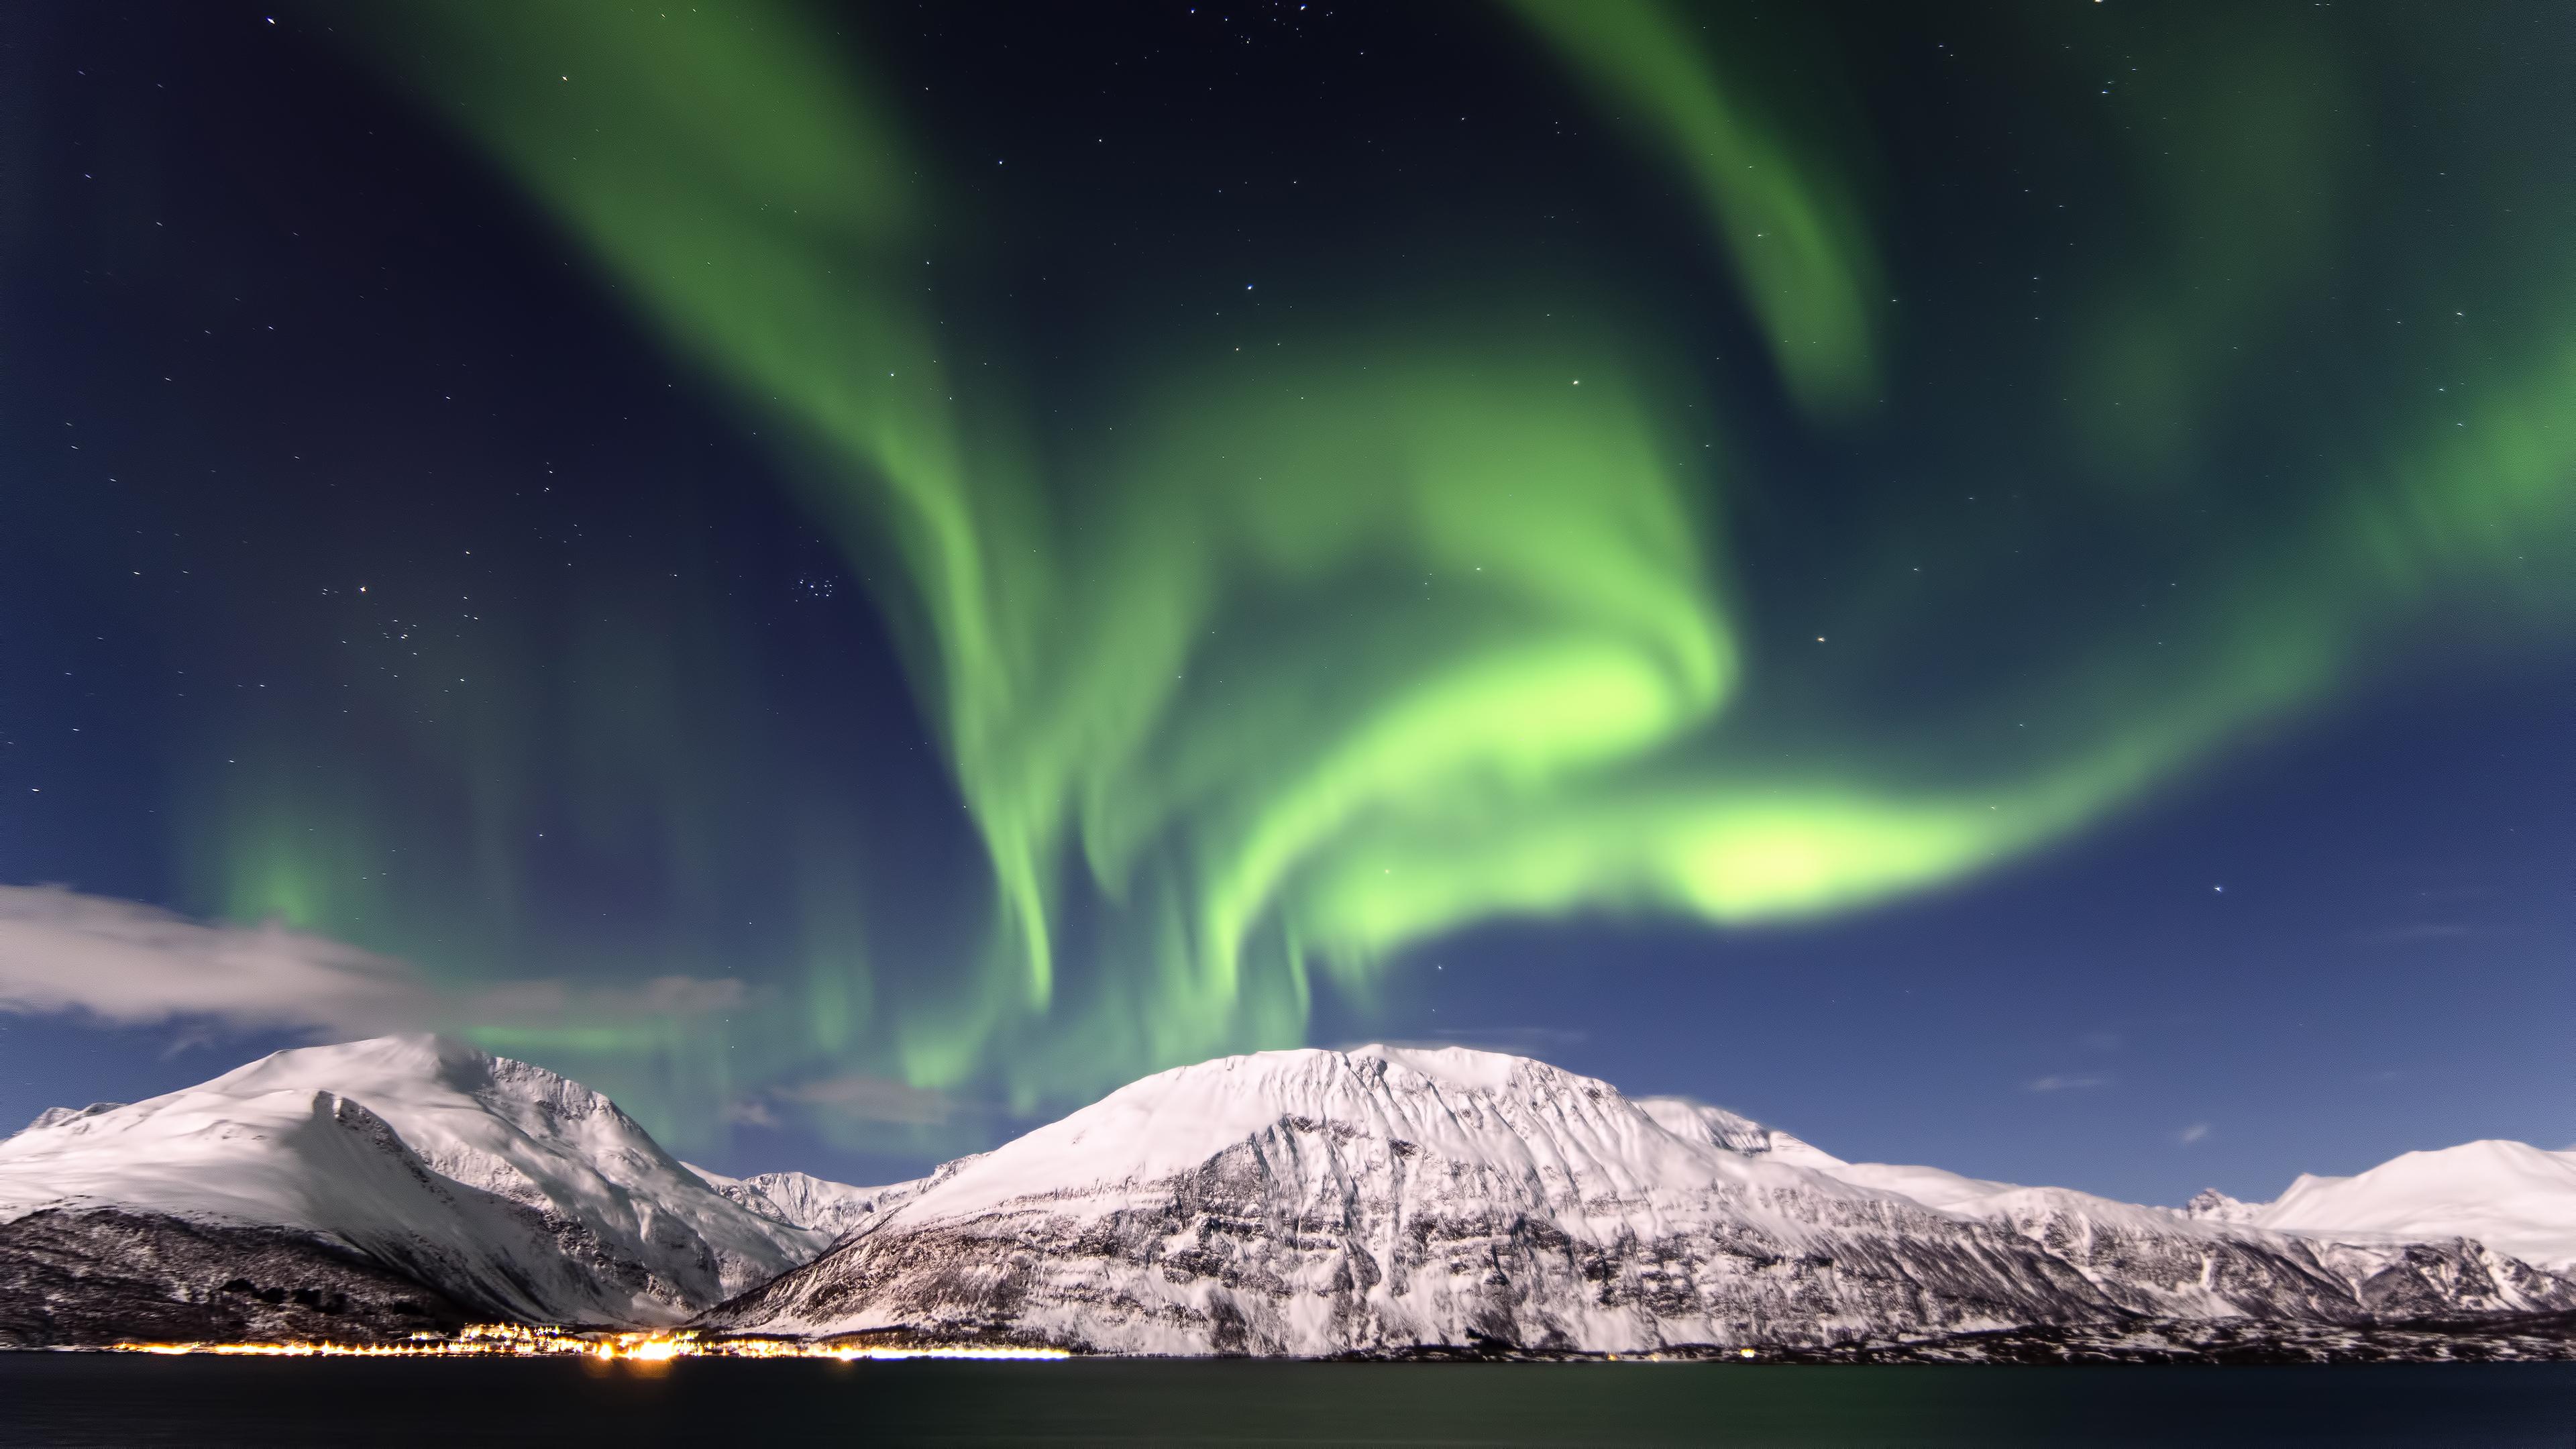 northern lights wallpaper 4k - photo #33